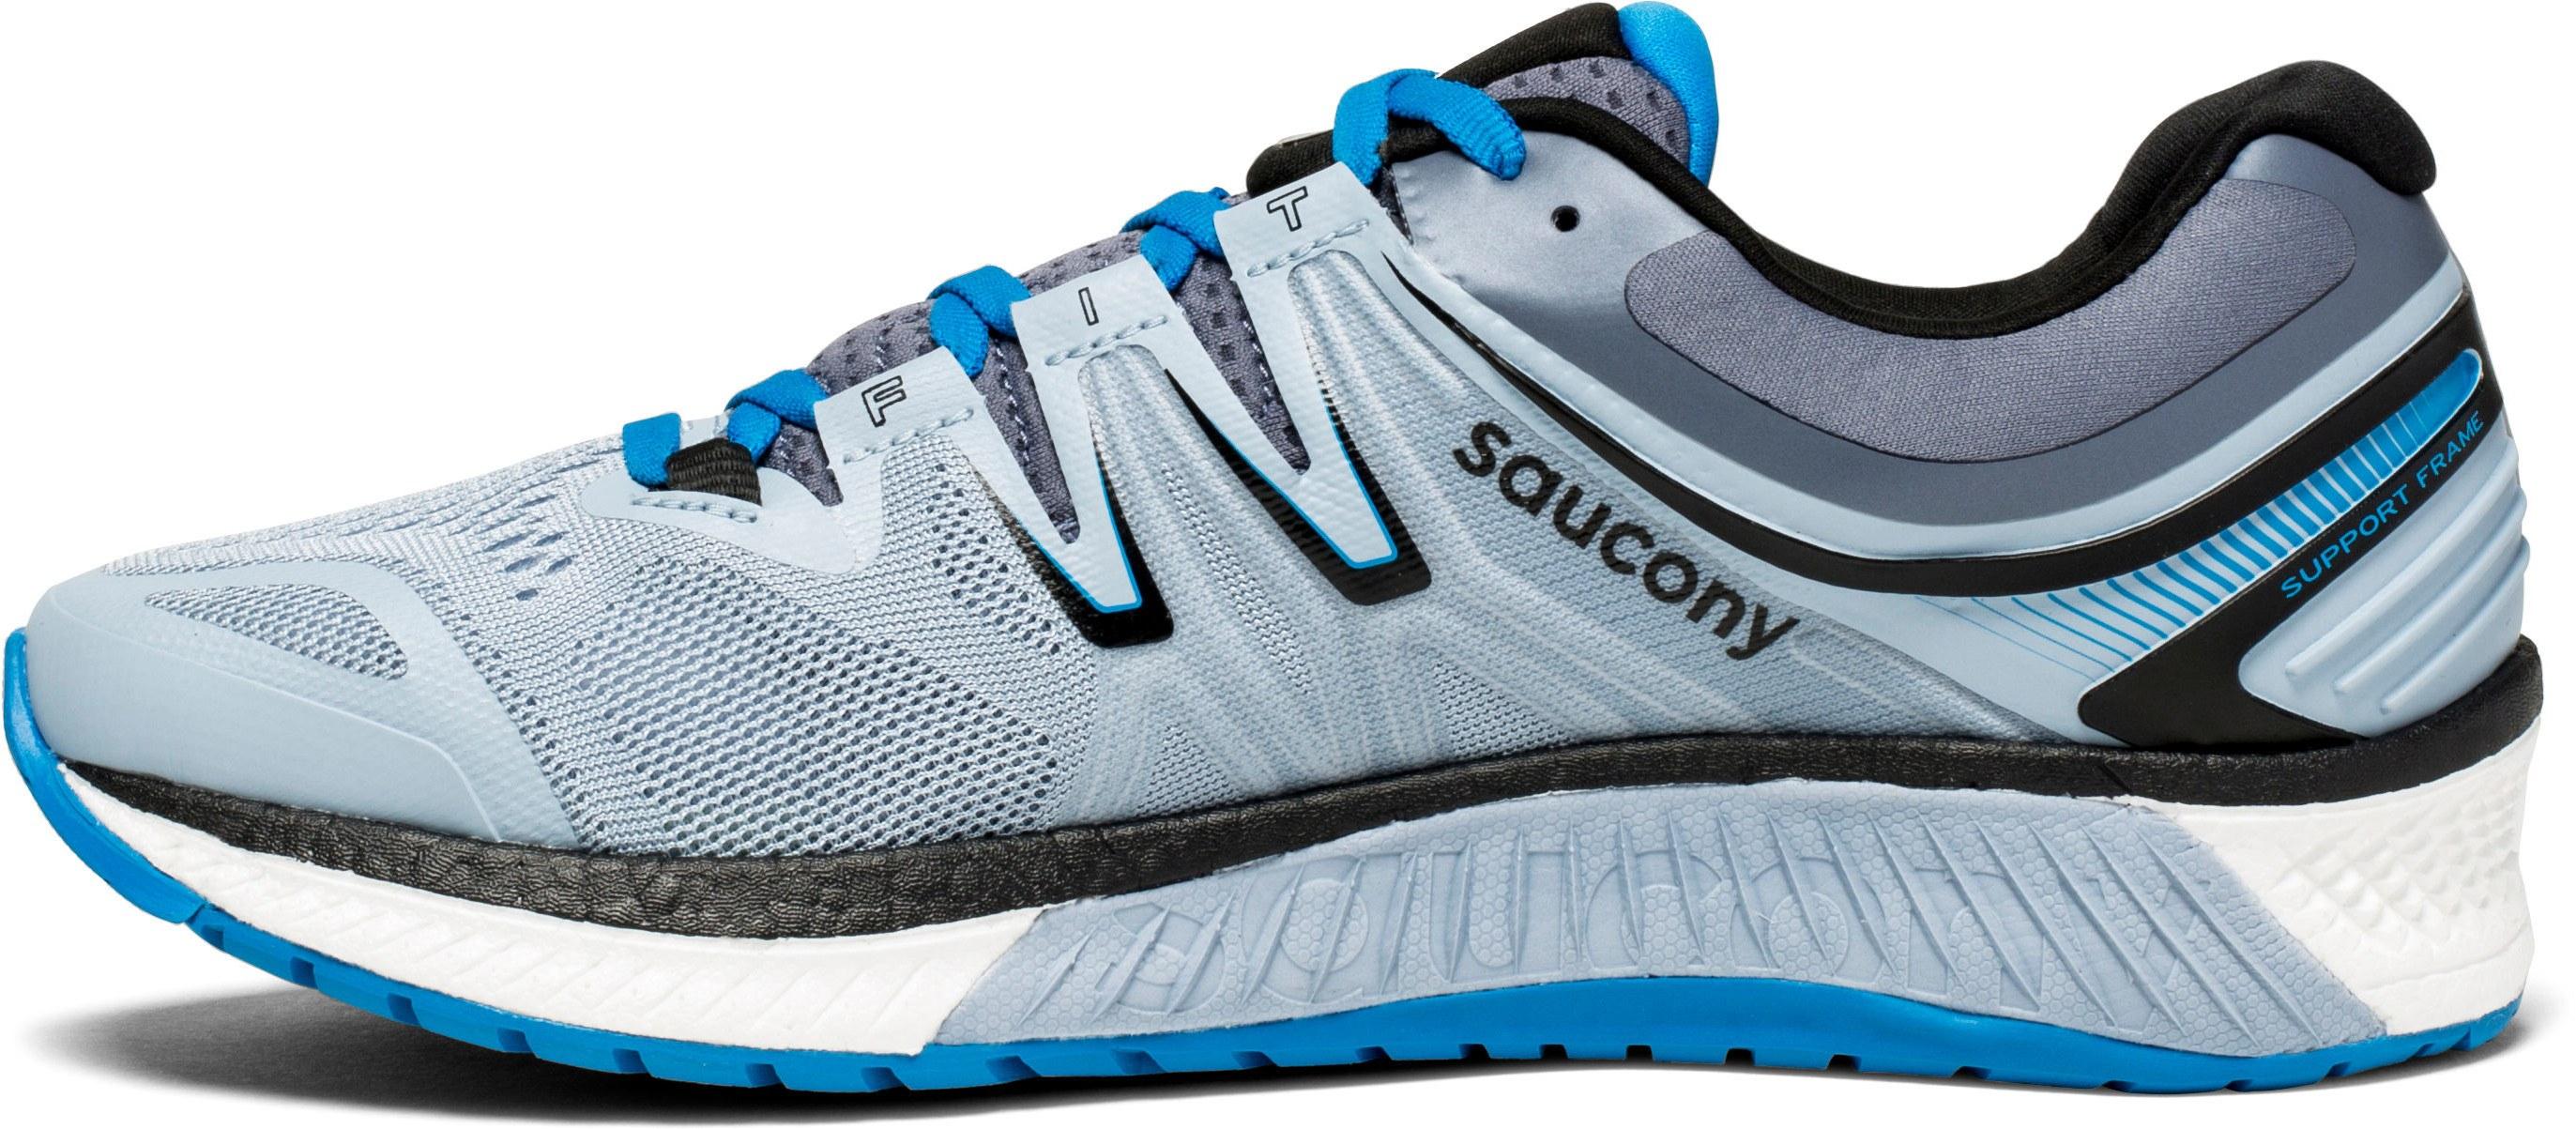 saucony_Hurricane_ISO_4_Shoes_sport2000_salon